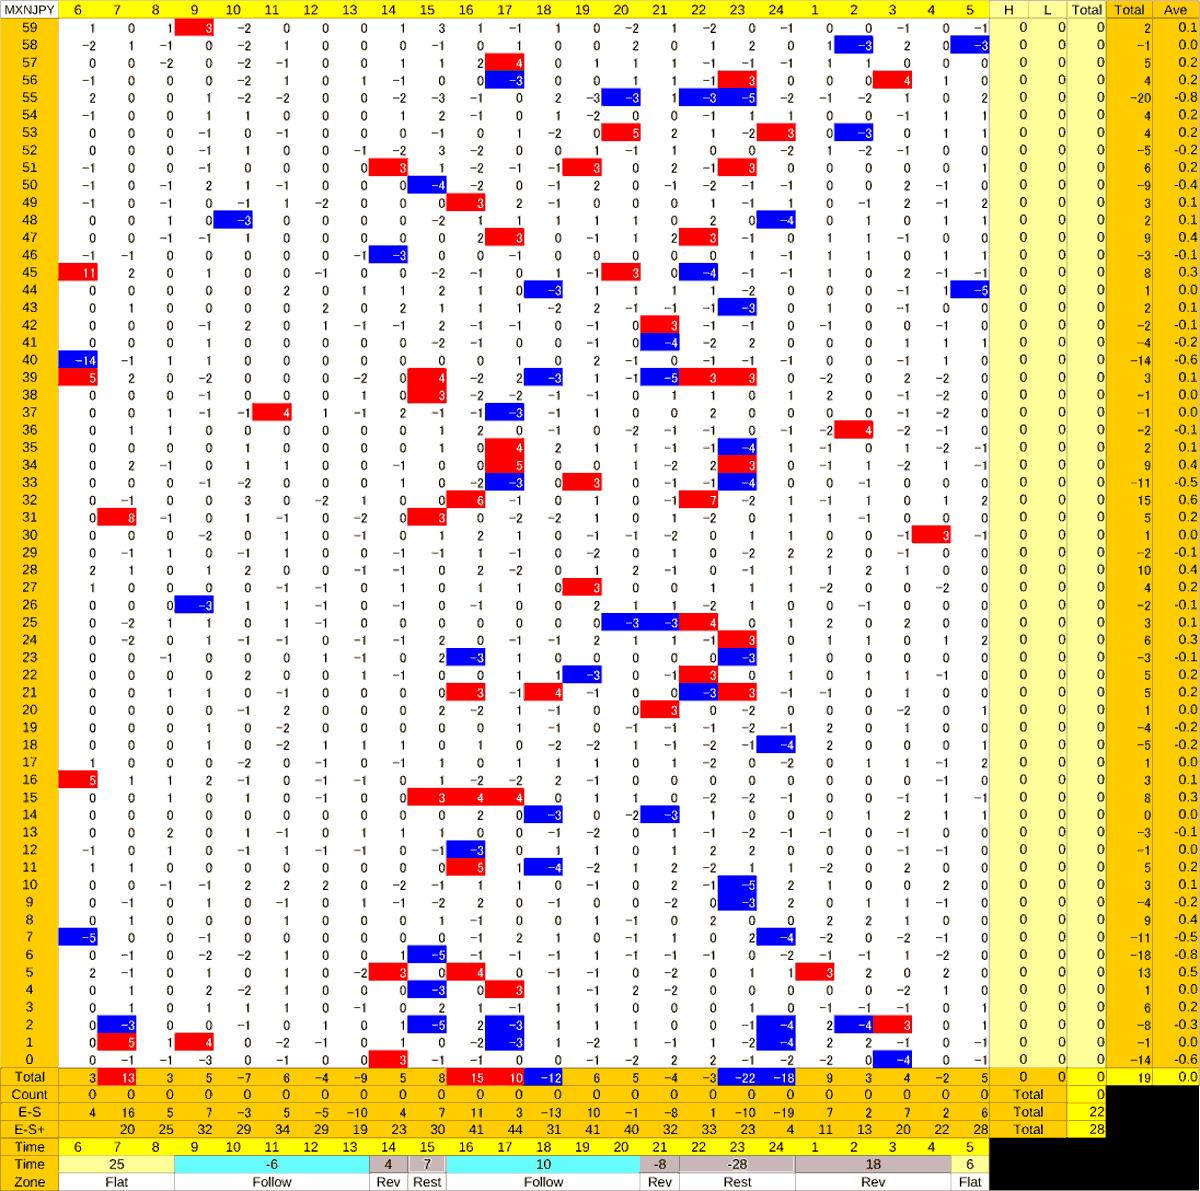 20200708_HS(3)MXNJPY